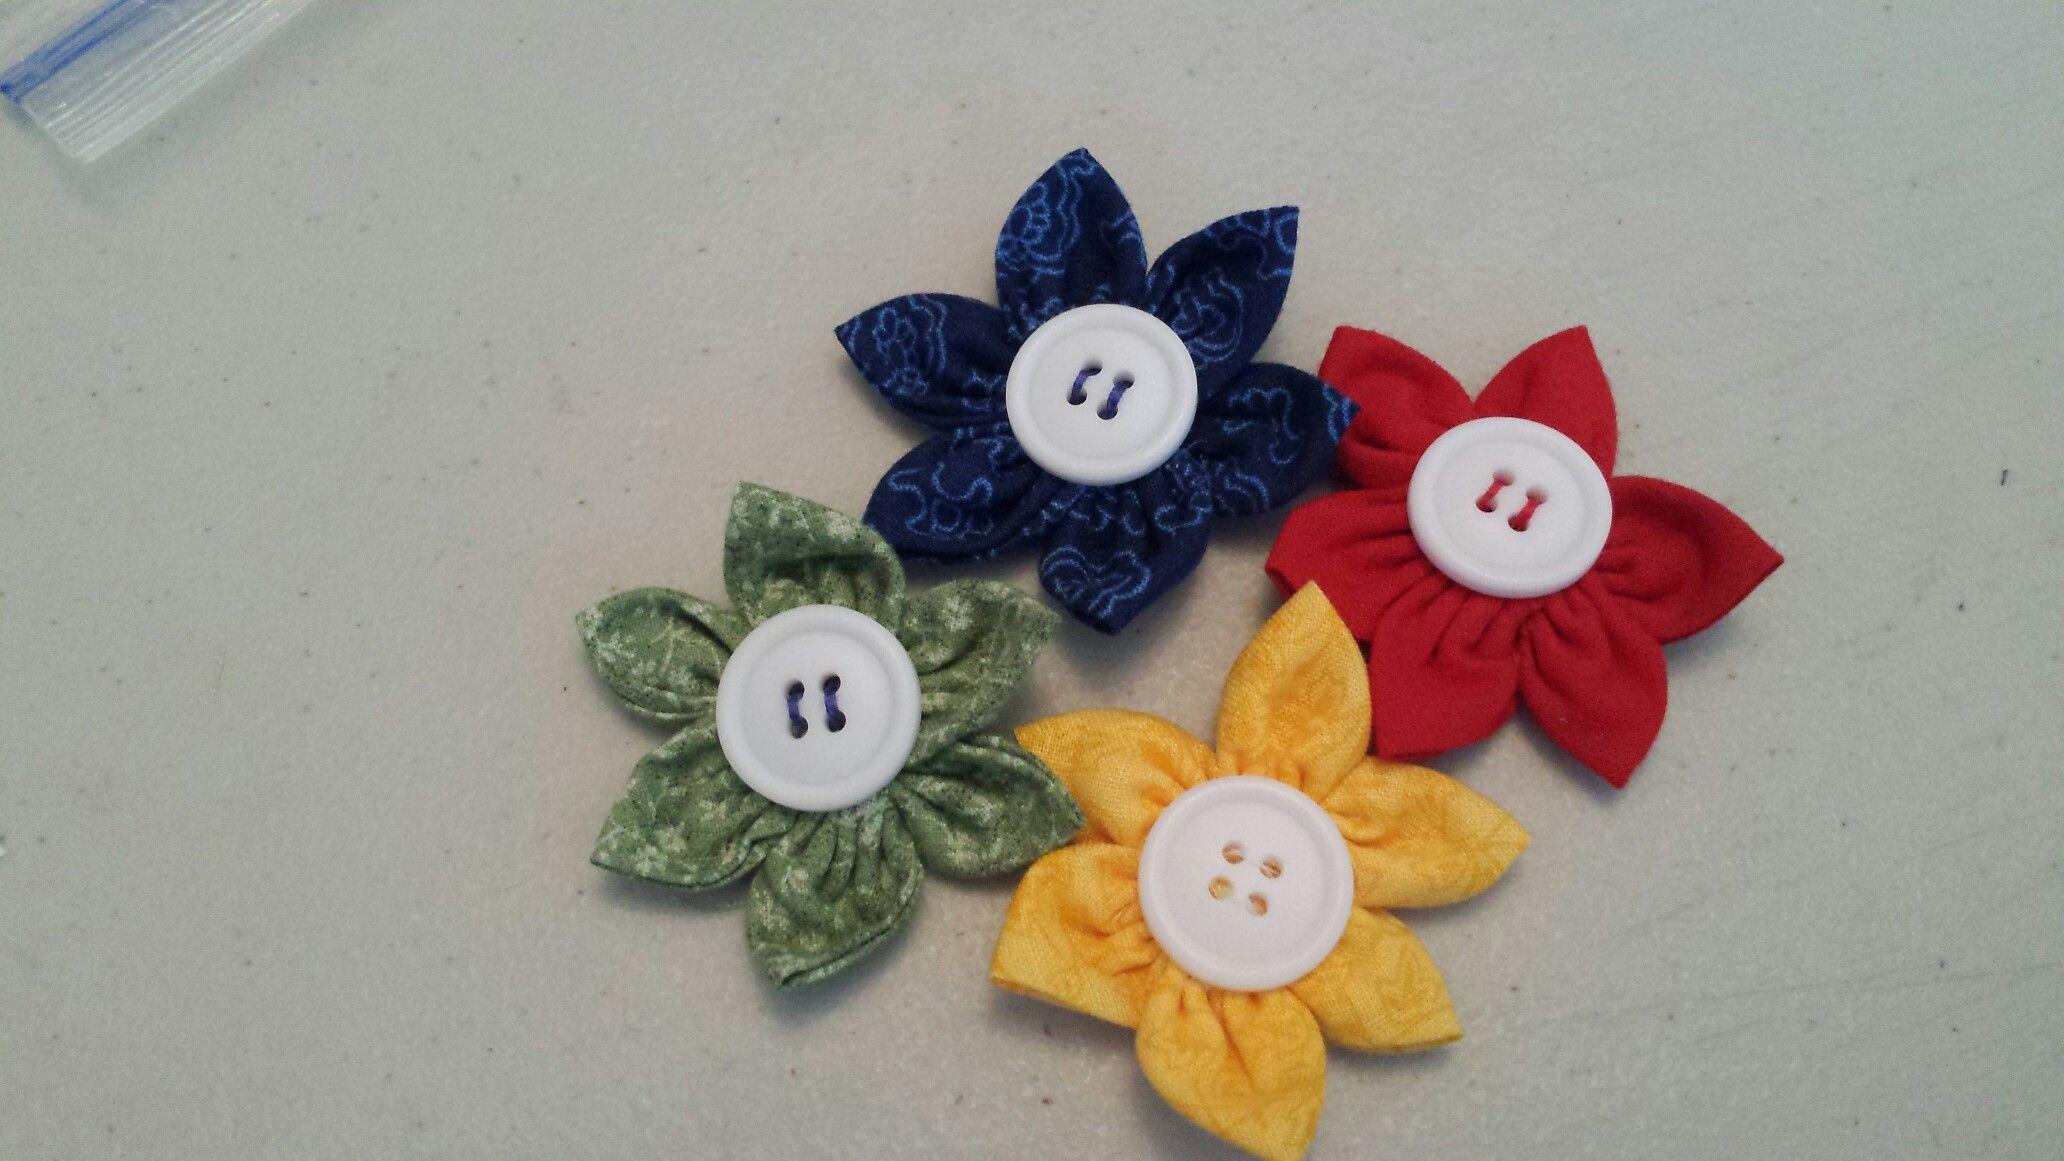 Yoyo flowers | Christmas ornaments, Holiday decor, Crafts